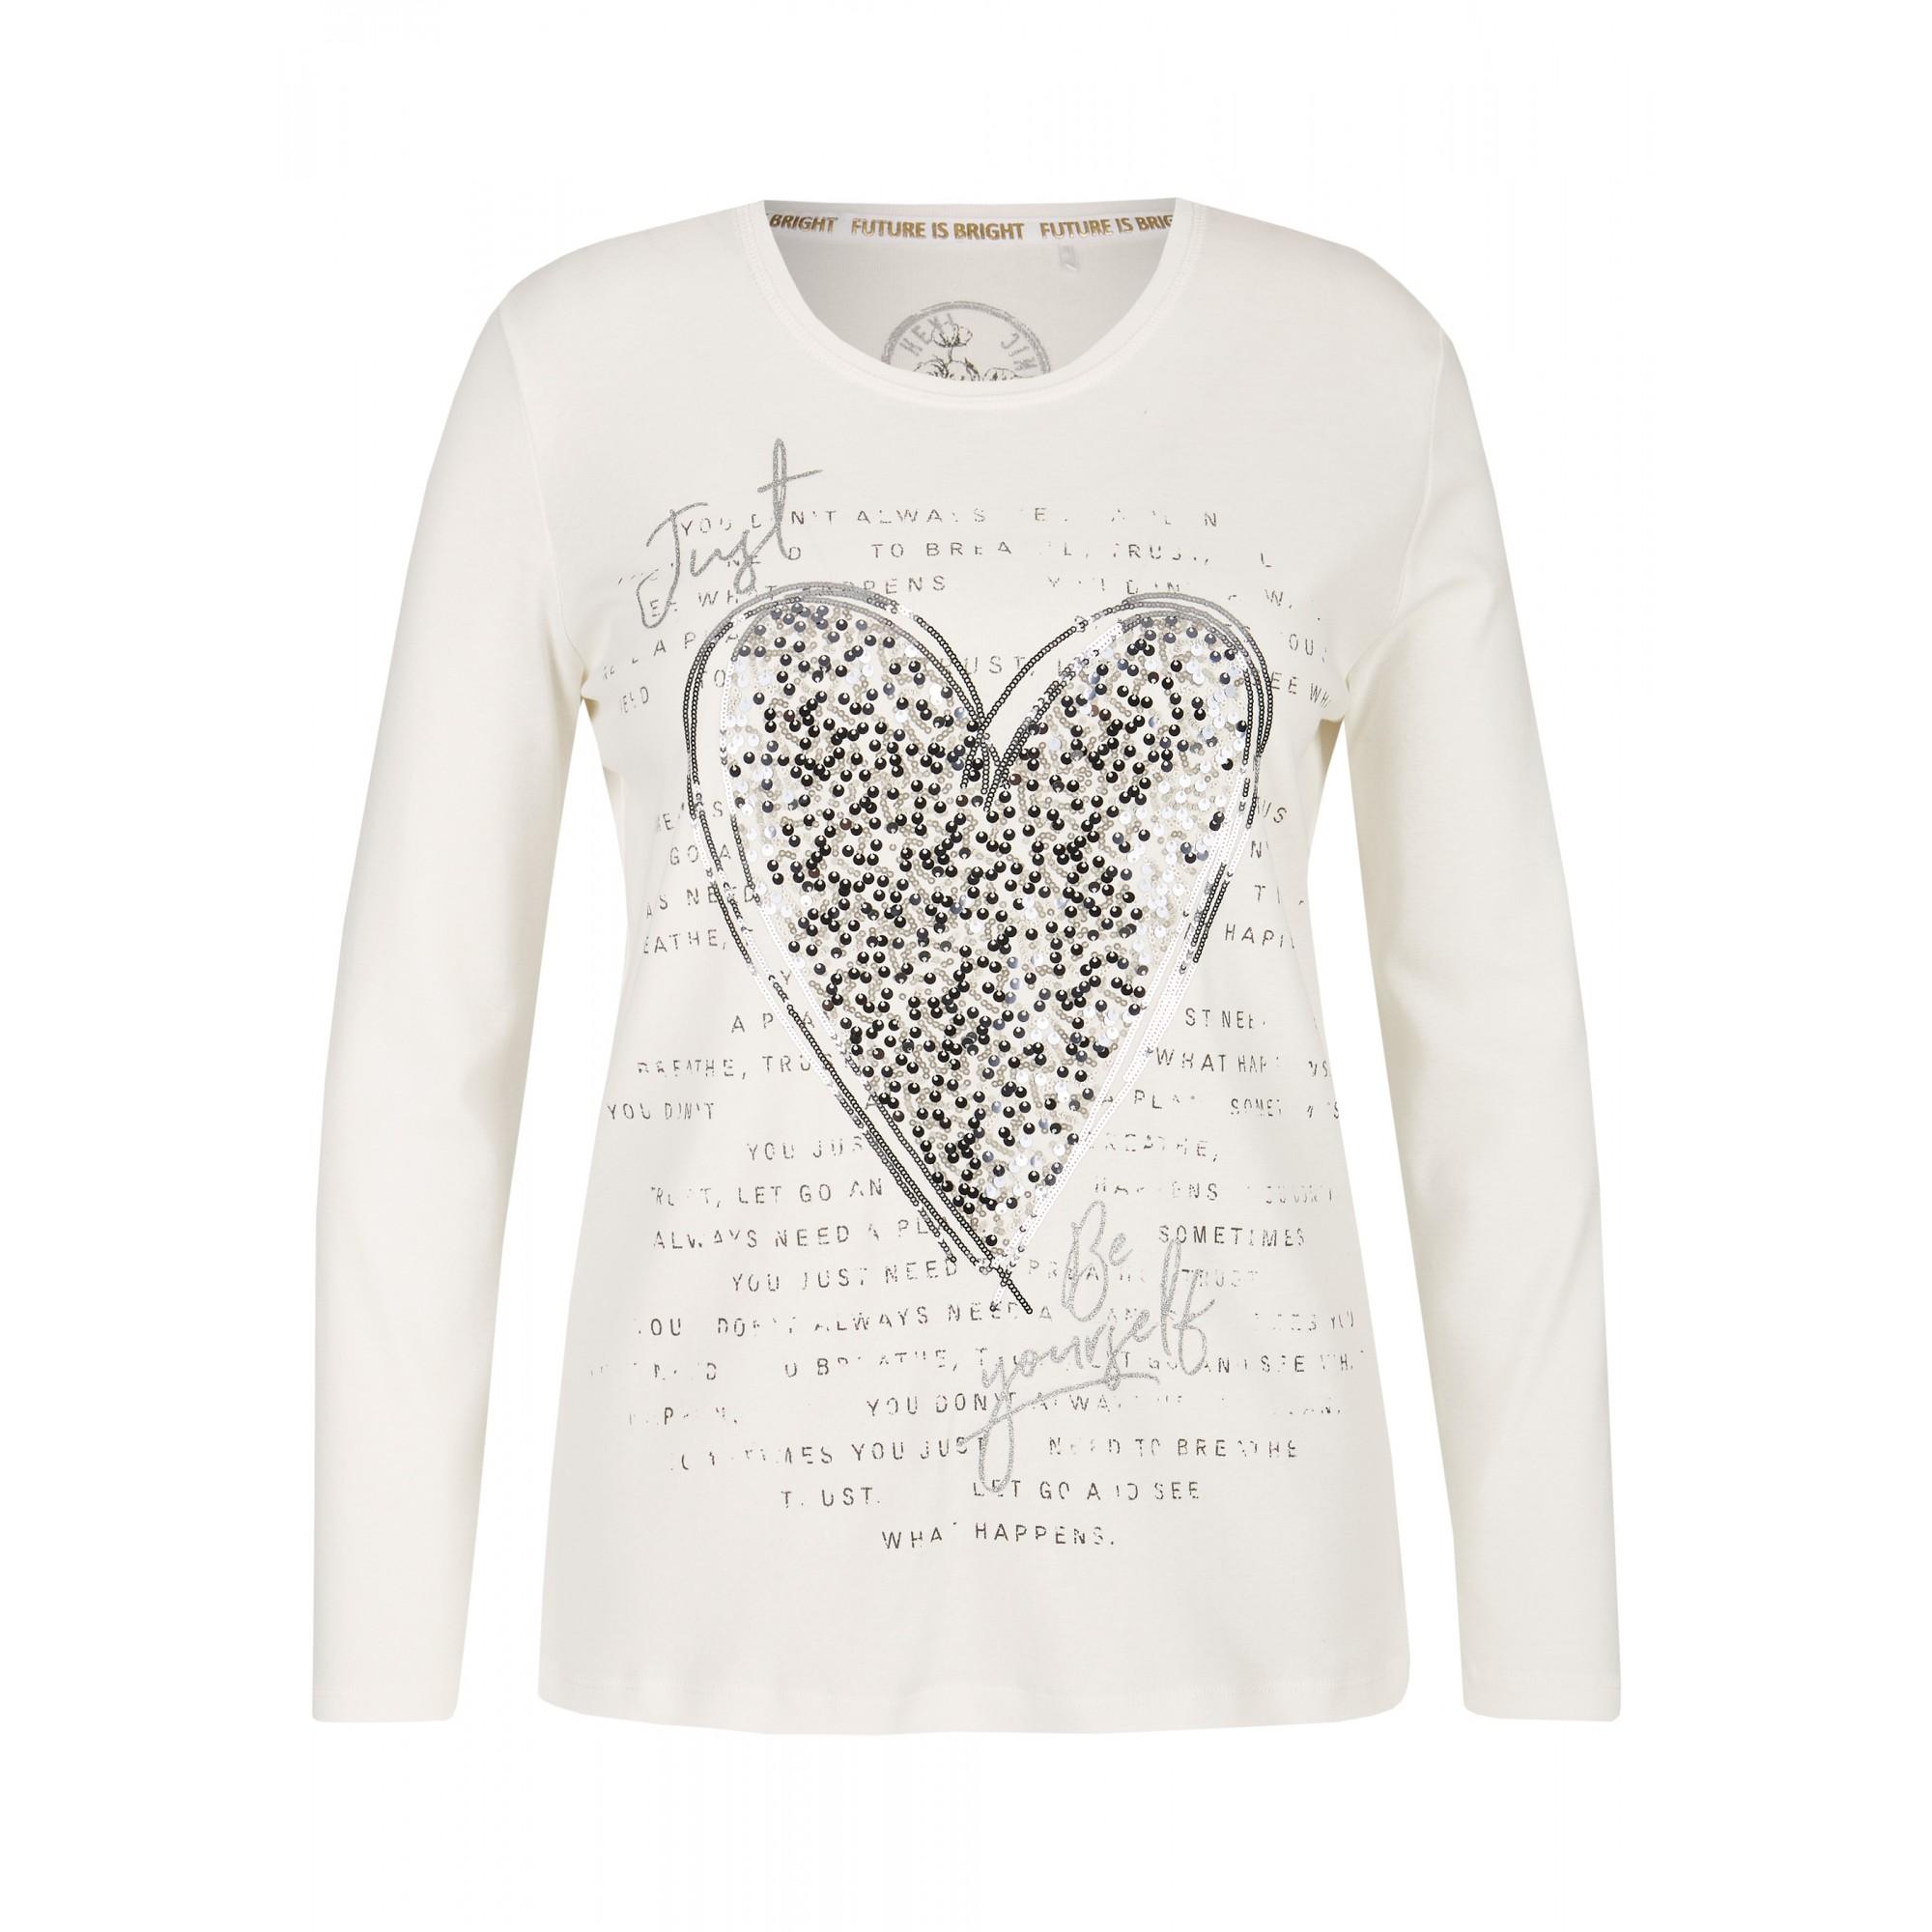 - Blickdichtes White Shirt mit geschmücktem Herz